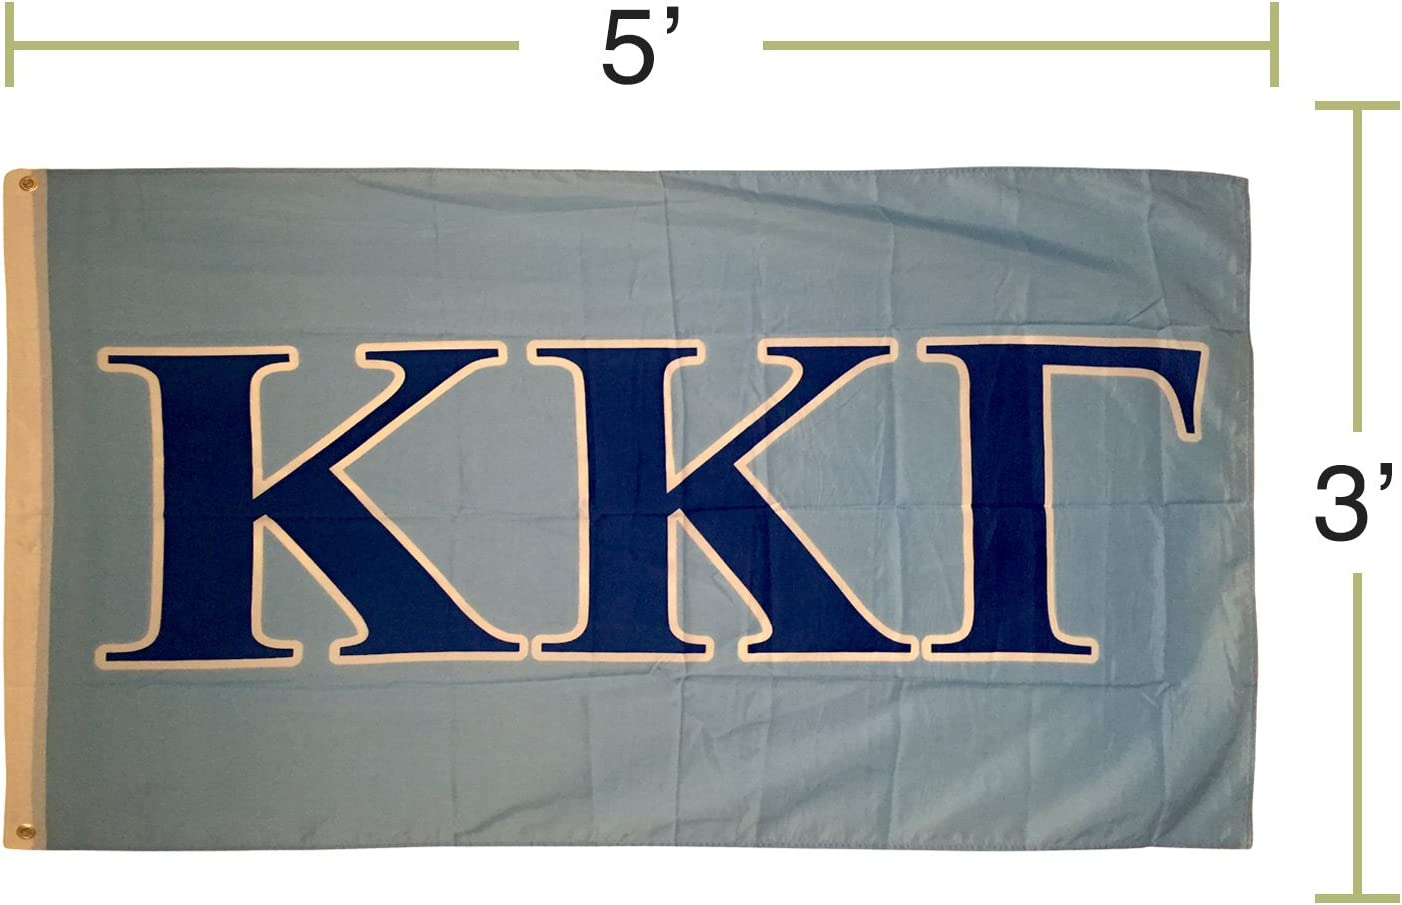 Kappa Kappa Gamma Letter Sorority Flag Greek Letter Use as a Banner Large 3 x 5 Feet Sign Decor KKG